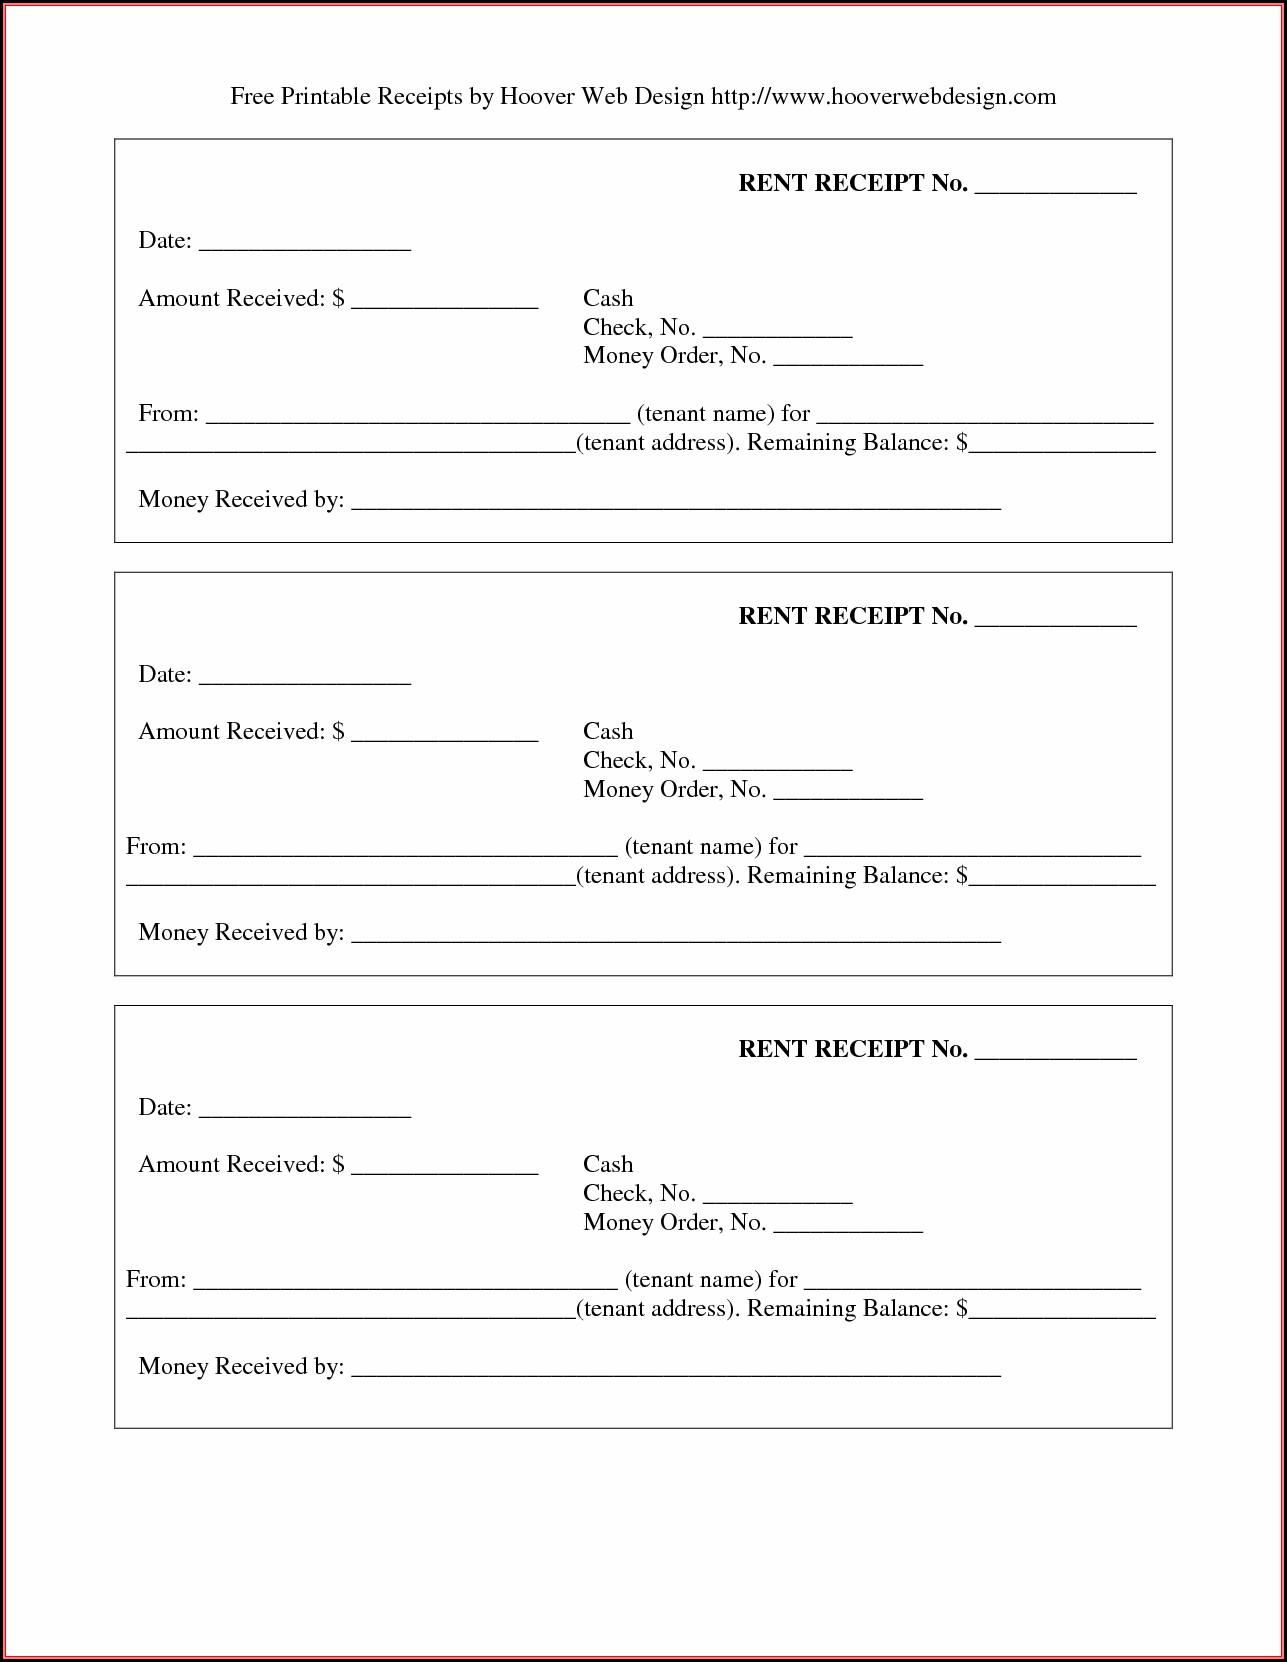 Free Printable Receipt Template